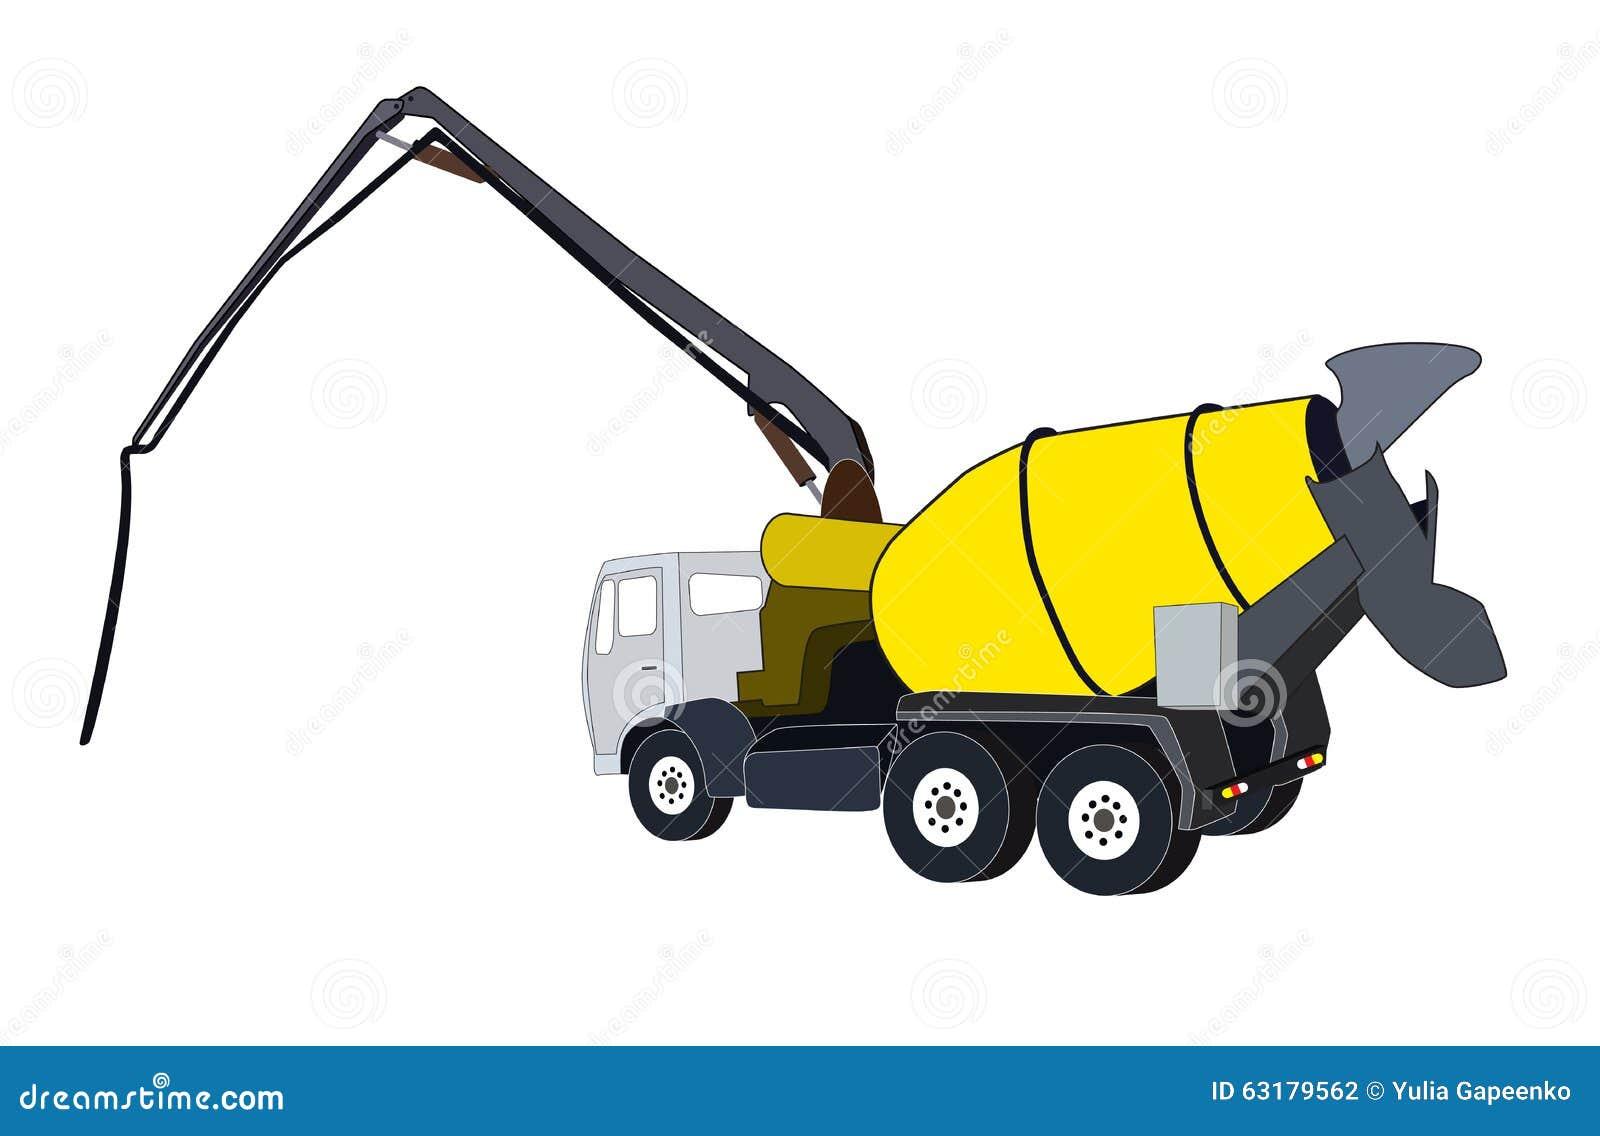 Machine Concrete Pump Vector Illustration Stock Vector